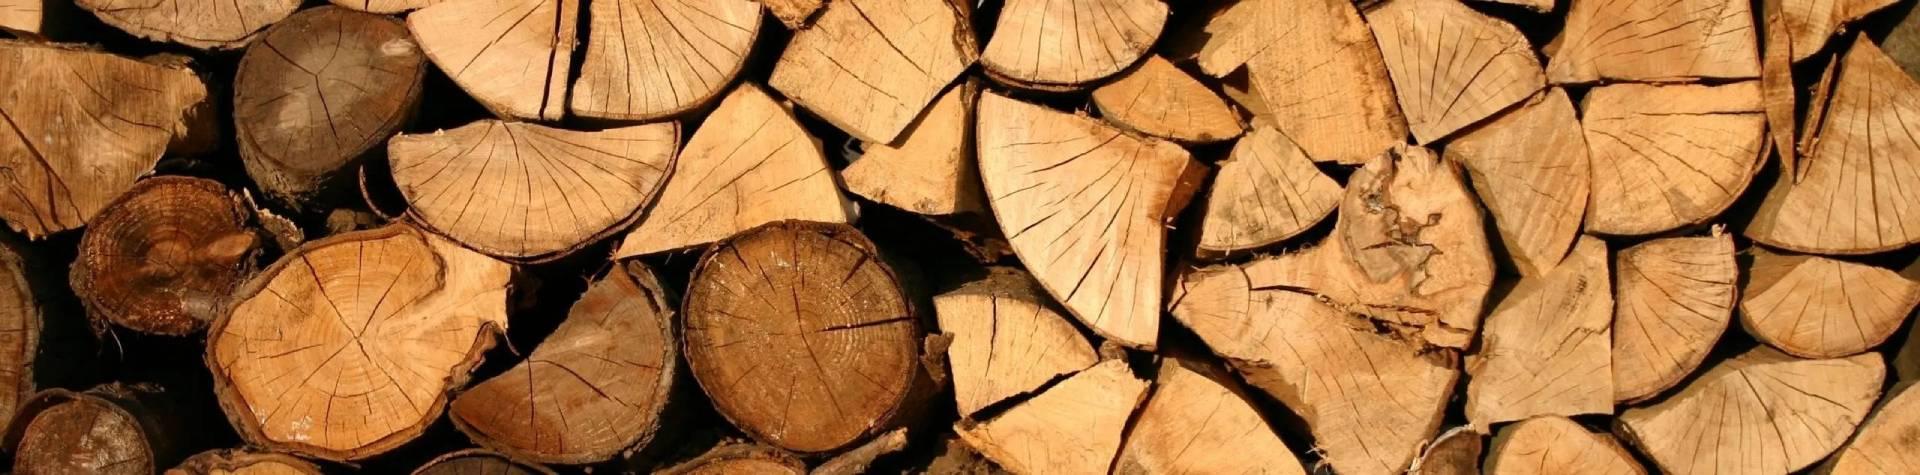 Black Beard Woodworking